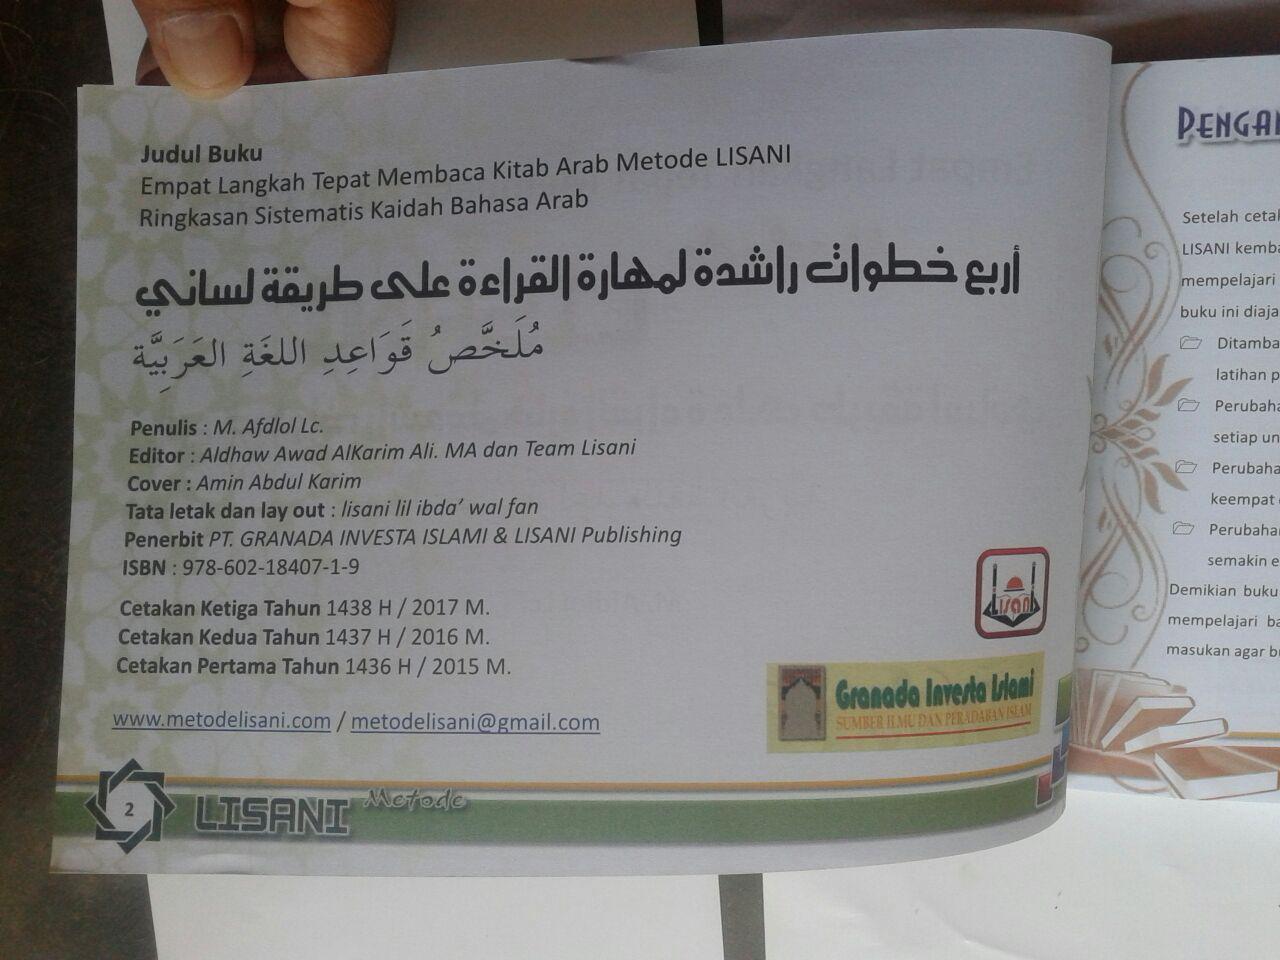 Buku 4 Langkah Tepat Membaca Kitab Arab Metode Lisani isi 6